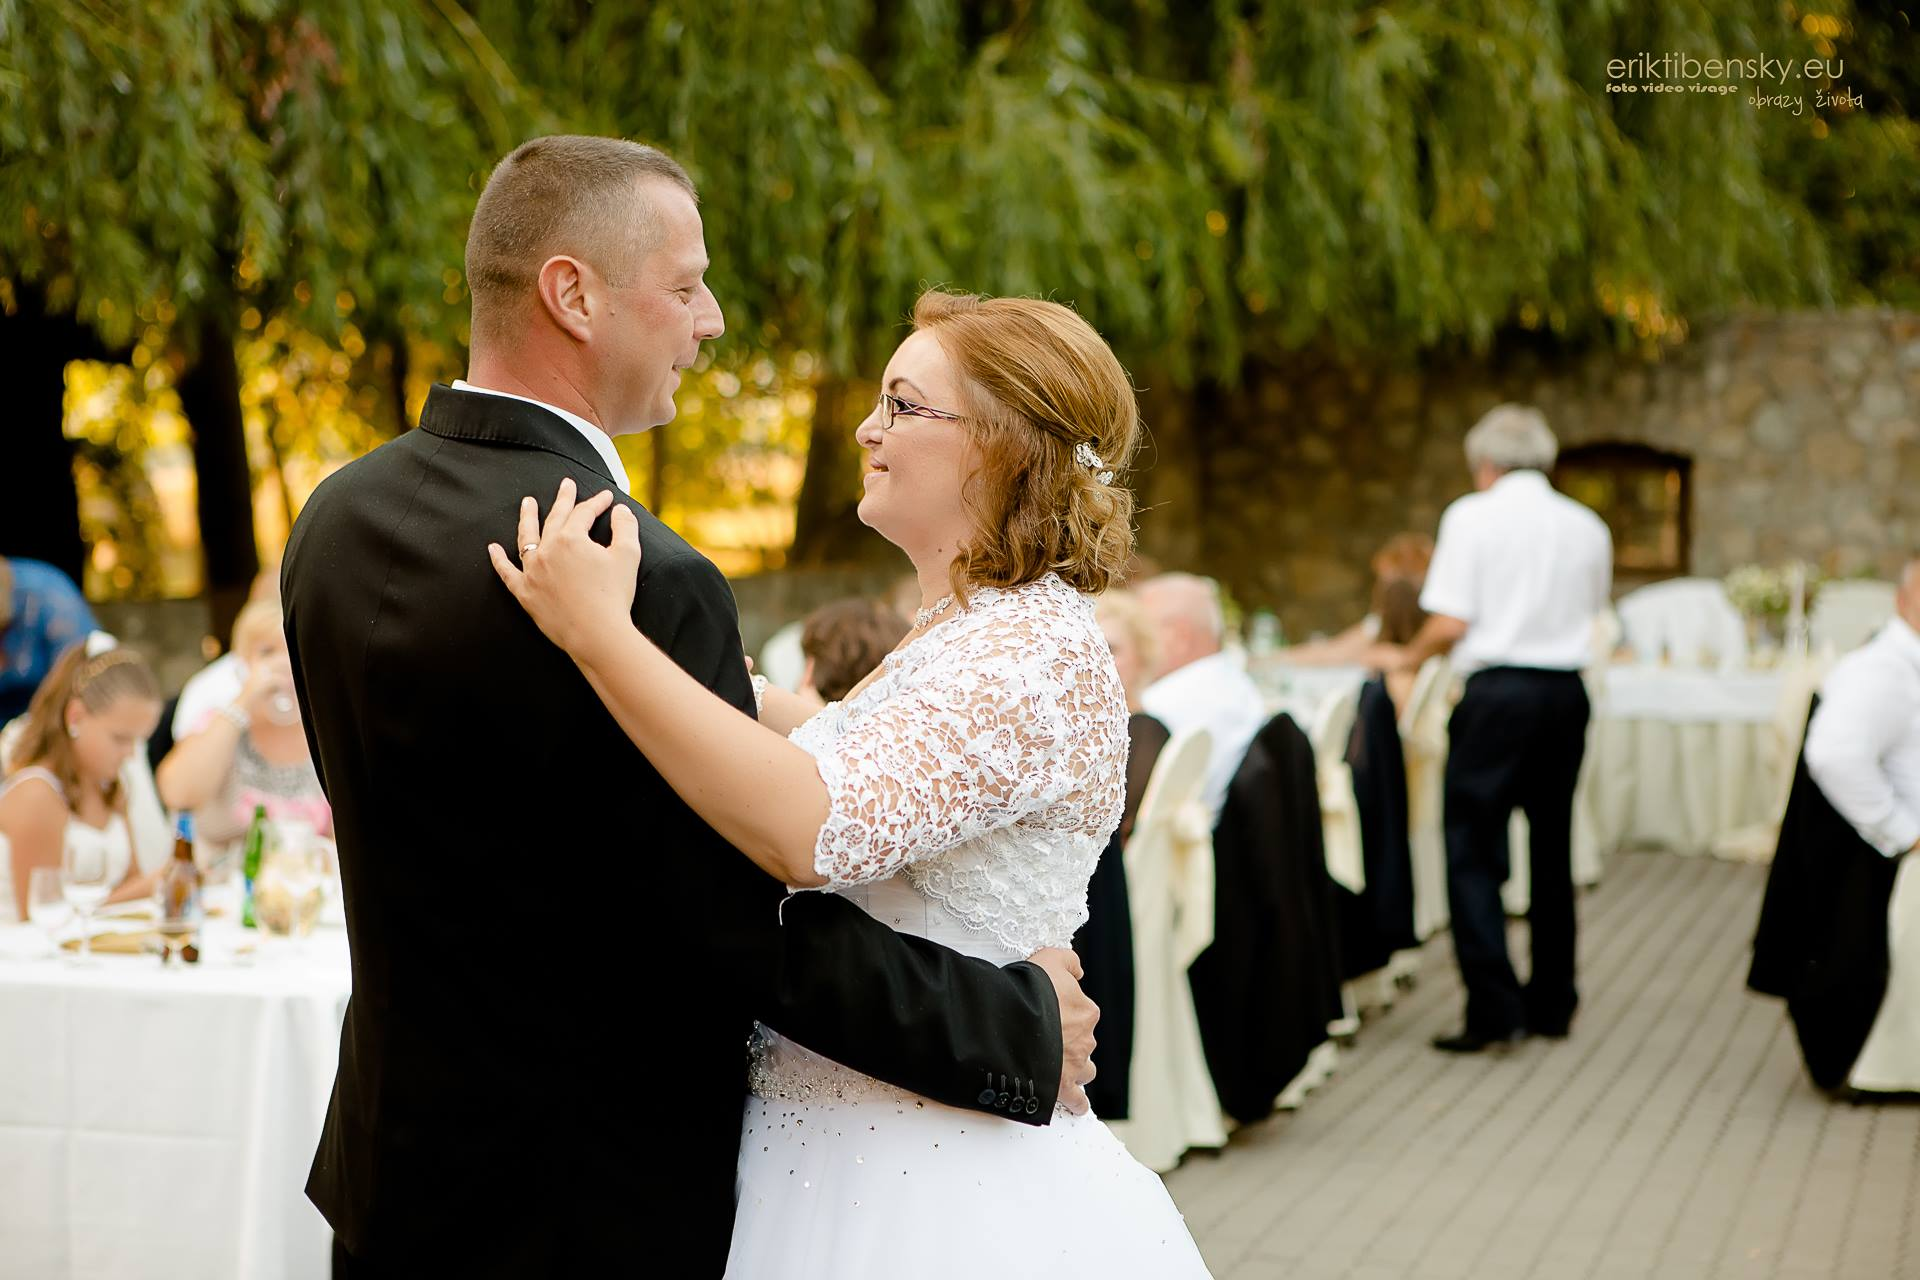 eriktibensky-eu-svadobny-fotograf-wedding-photographer-3041